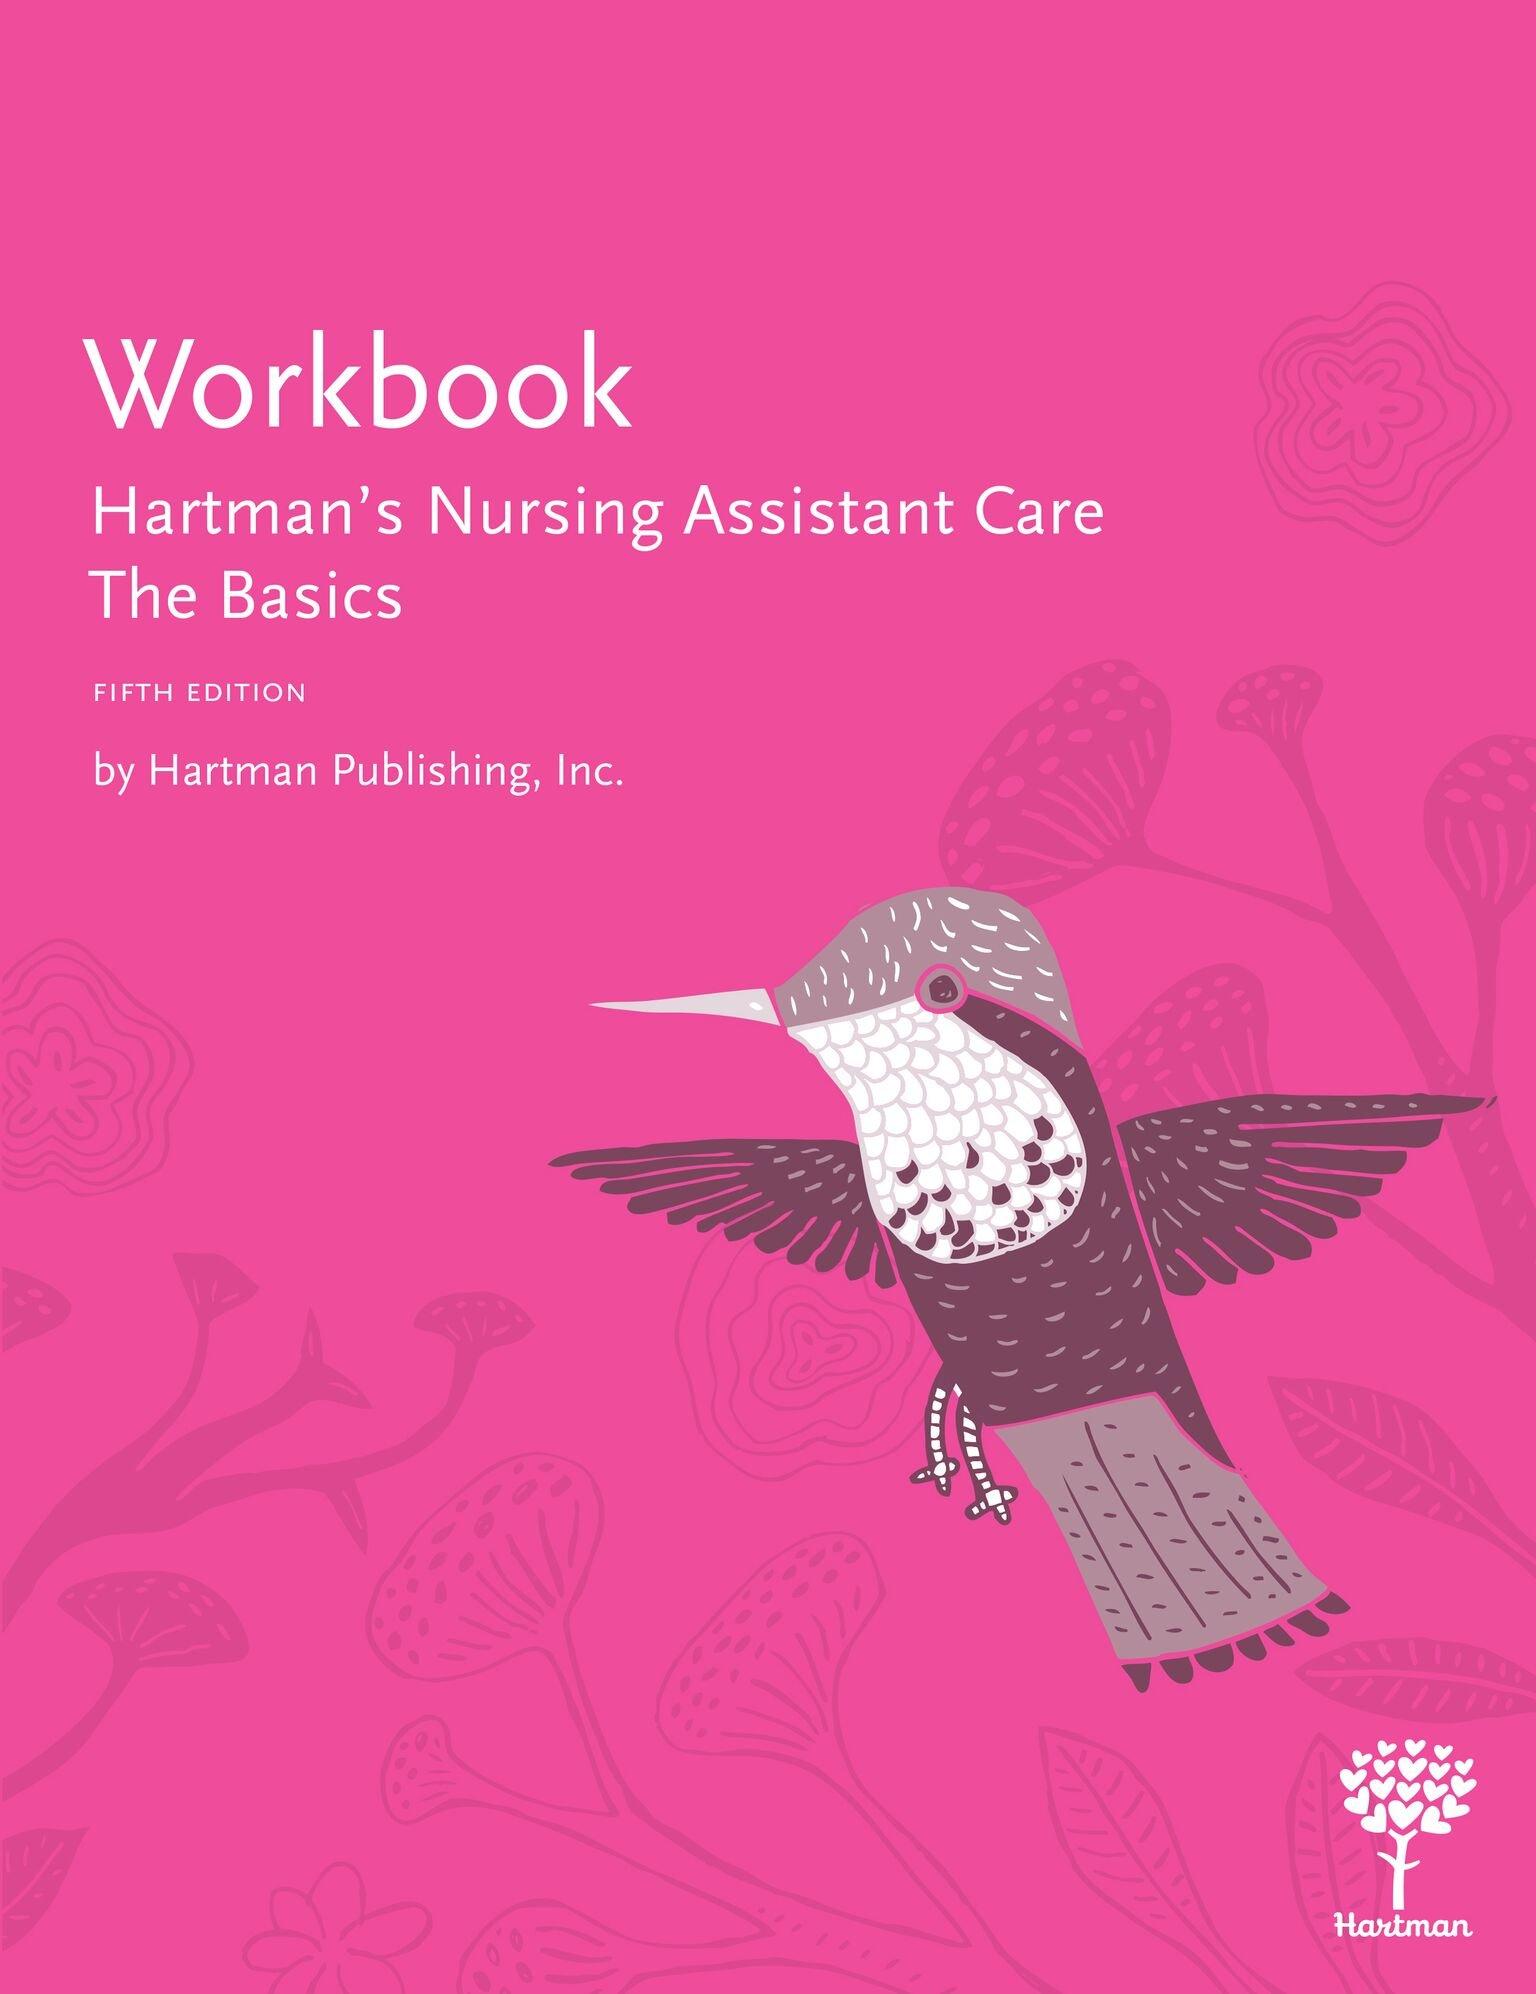 Workbook For Hartman S Nursing Assistant Care The Basics 5th Edition Hartman Publishing Inc 9781604251012 Amazon Com Books